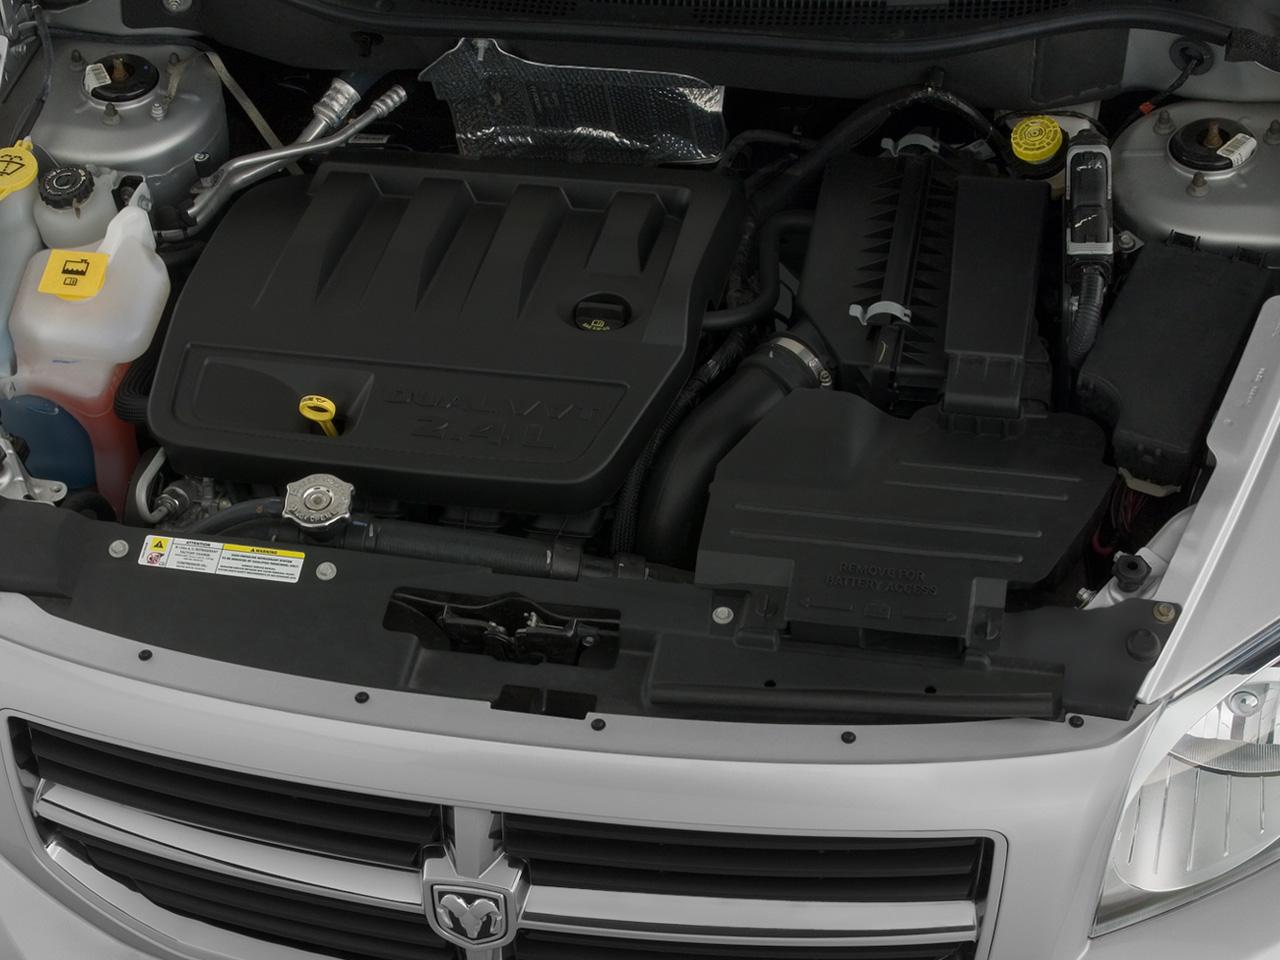 2008 Dodge Caliber Srt4 Latest News Reviews And